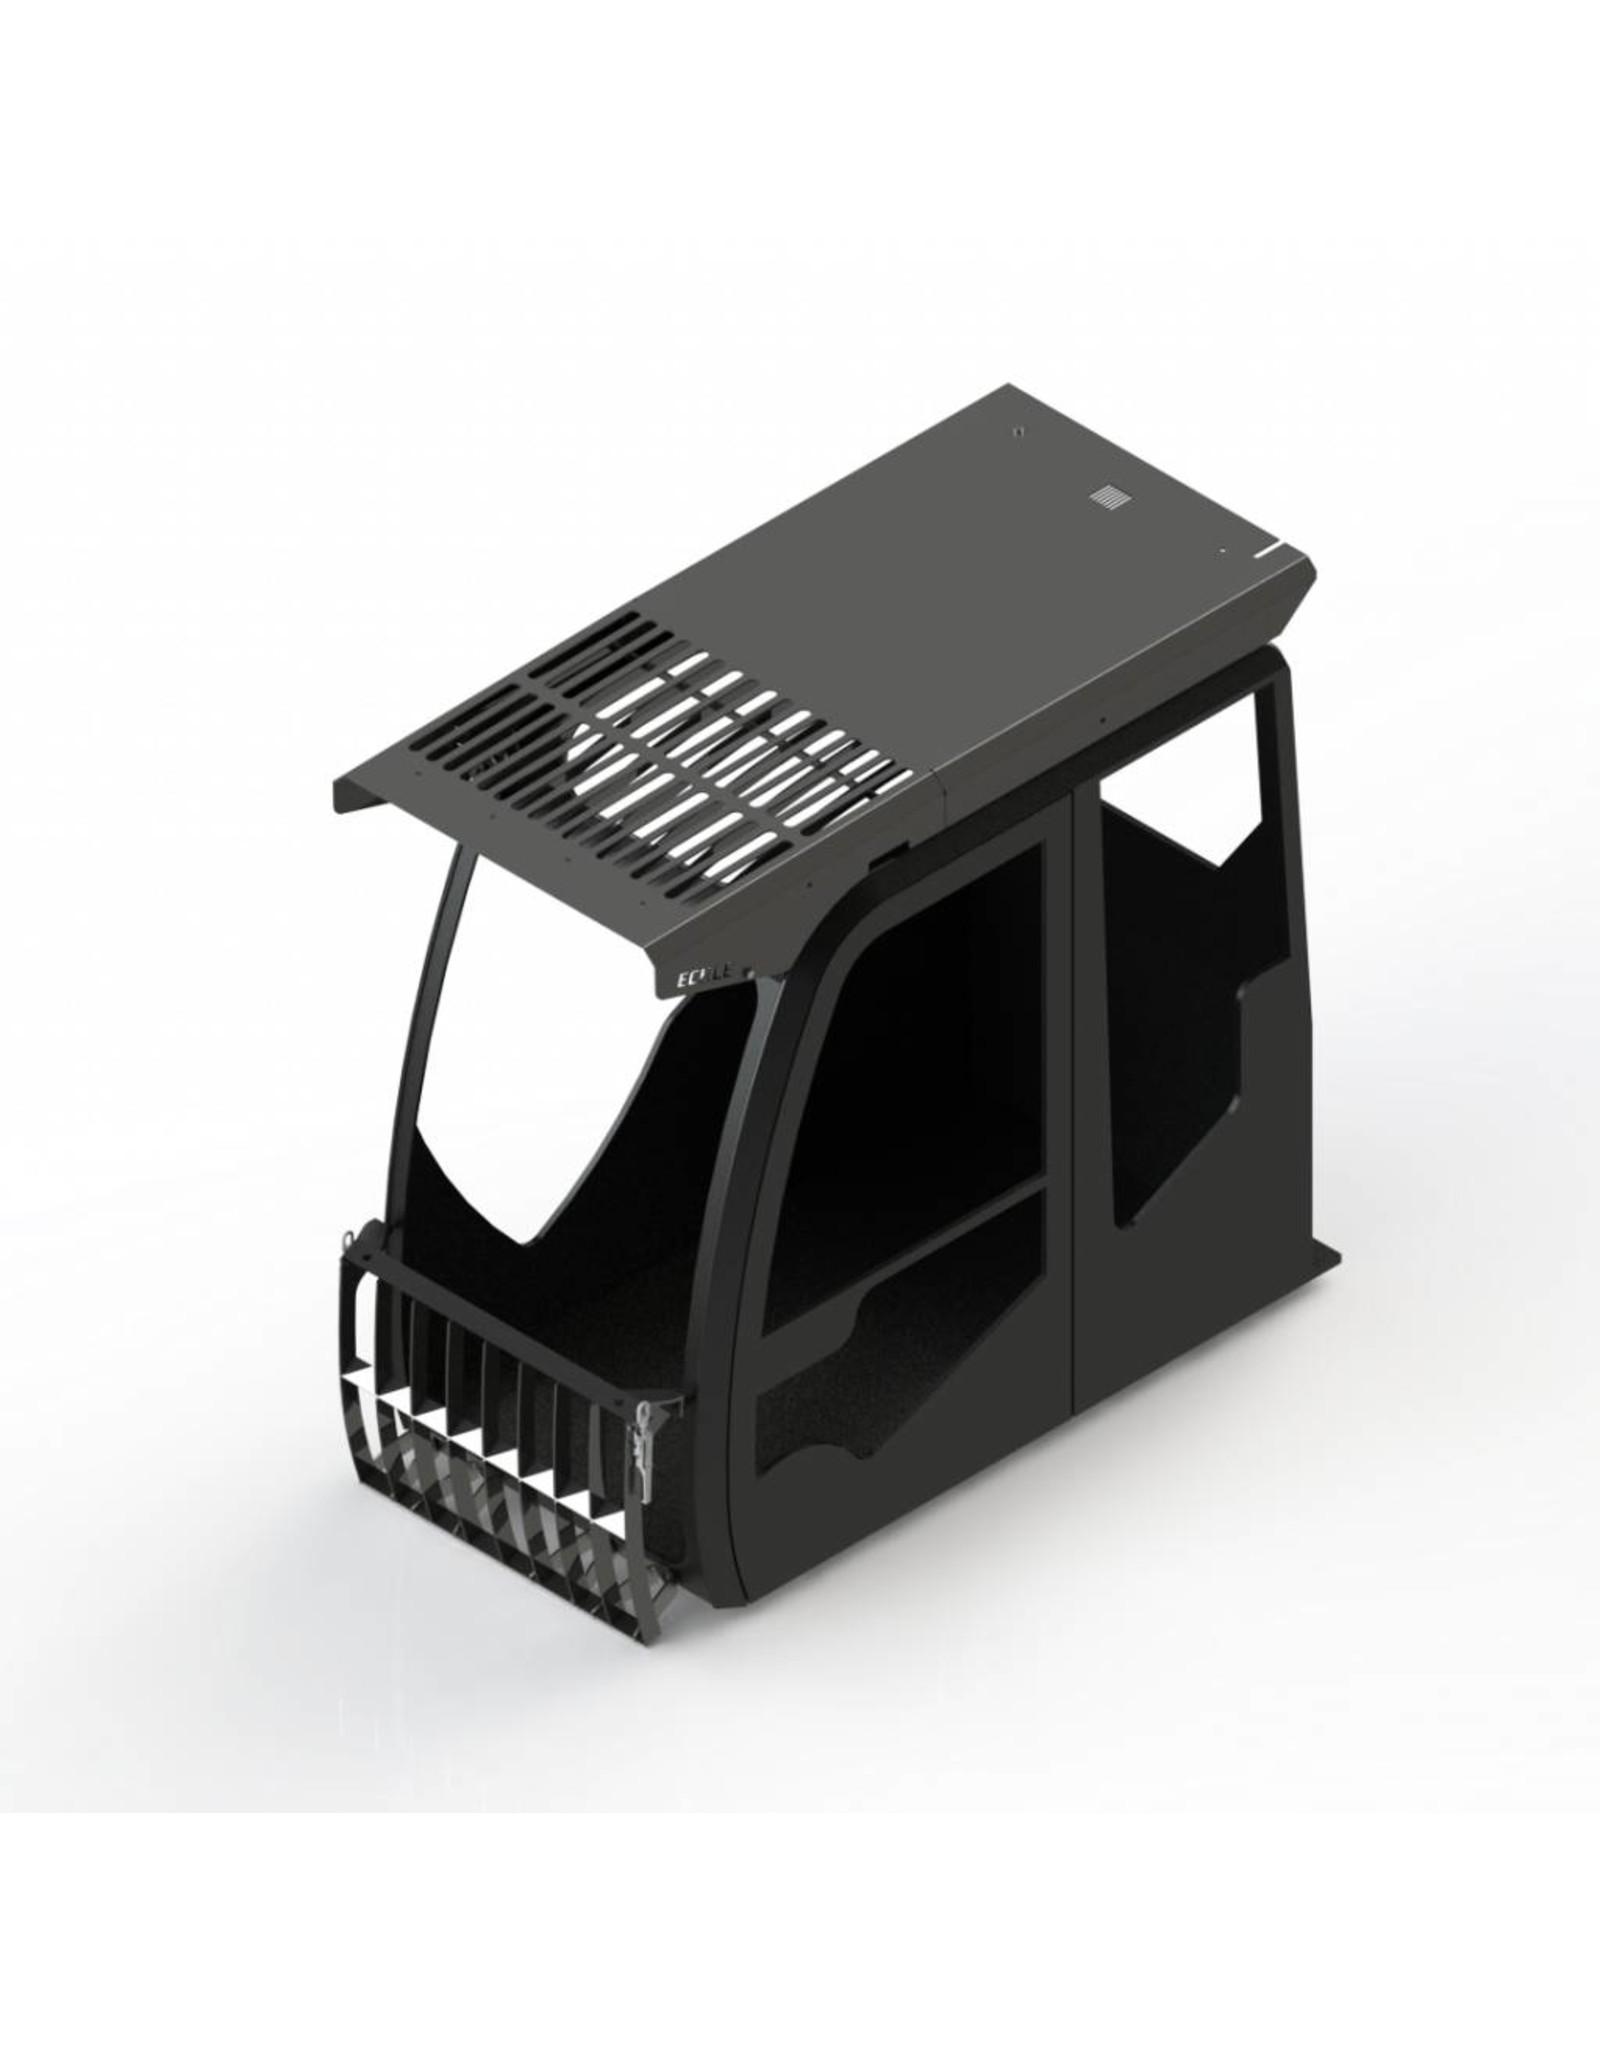 Echle Hartstahl GmbH FOPS for Hyundai HX260L